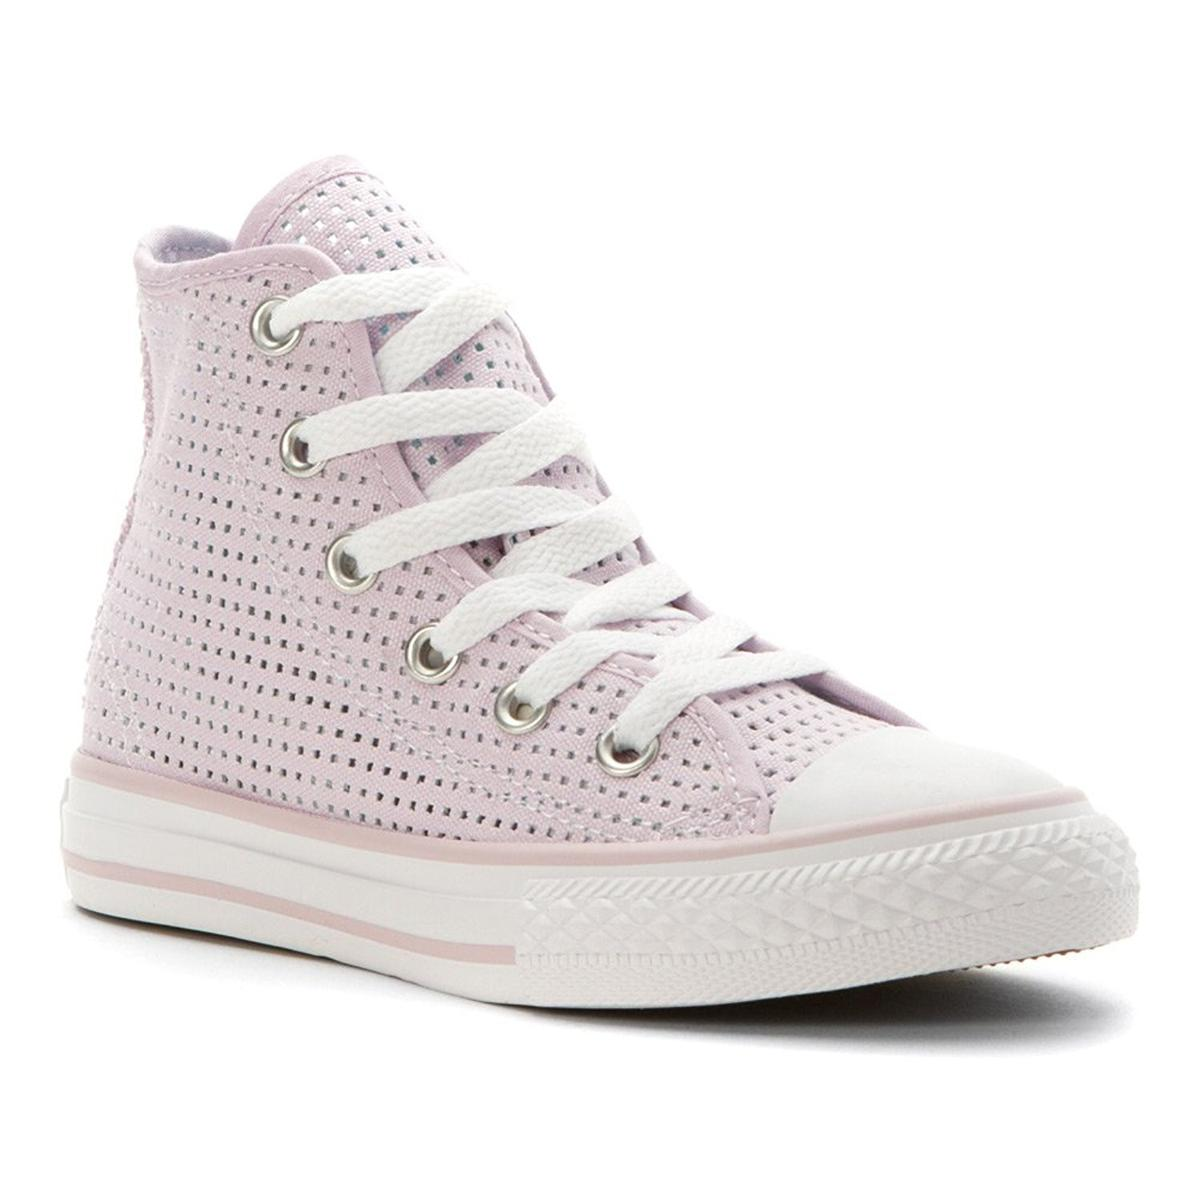 Converse Chuck Taylor High Top Girls Purple Dusk Mot Sneakers by Converse